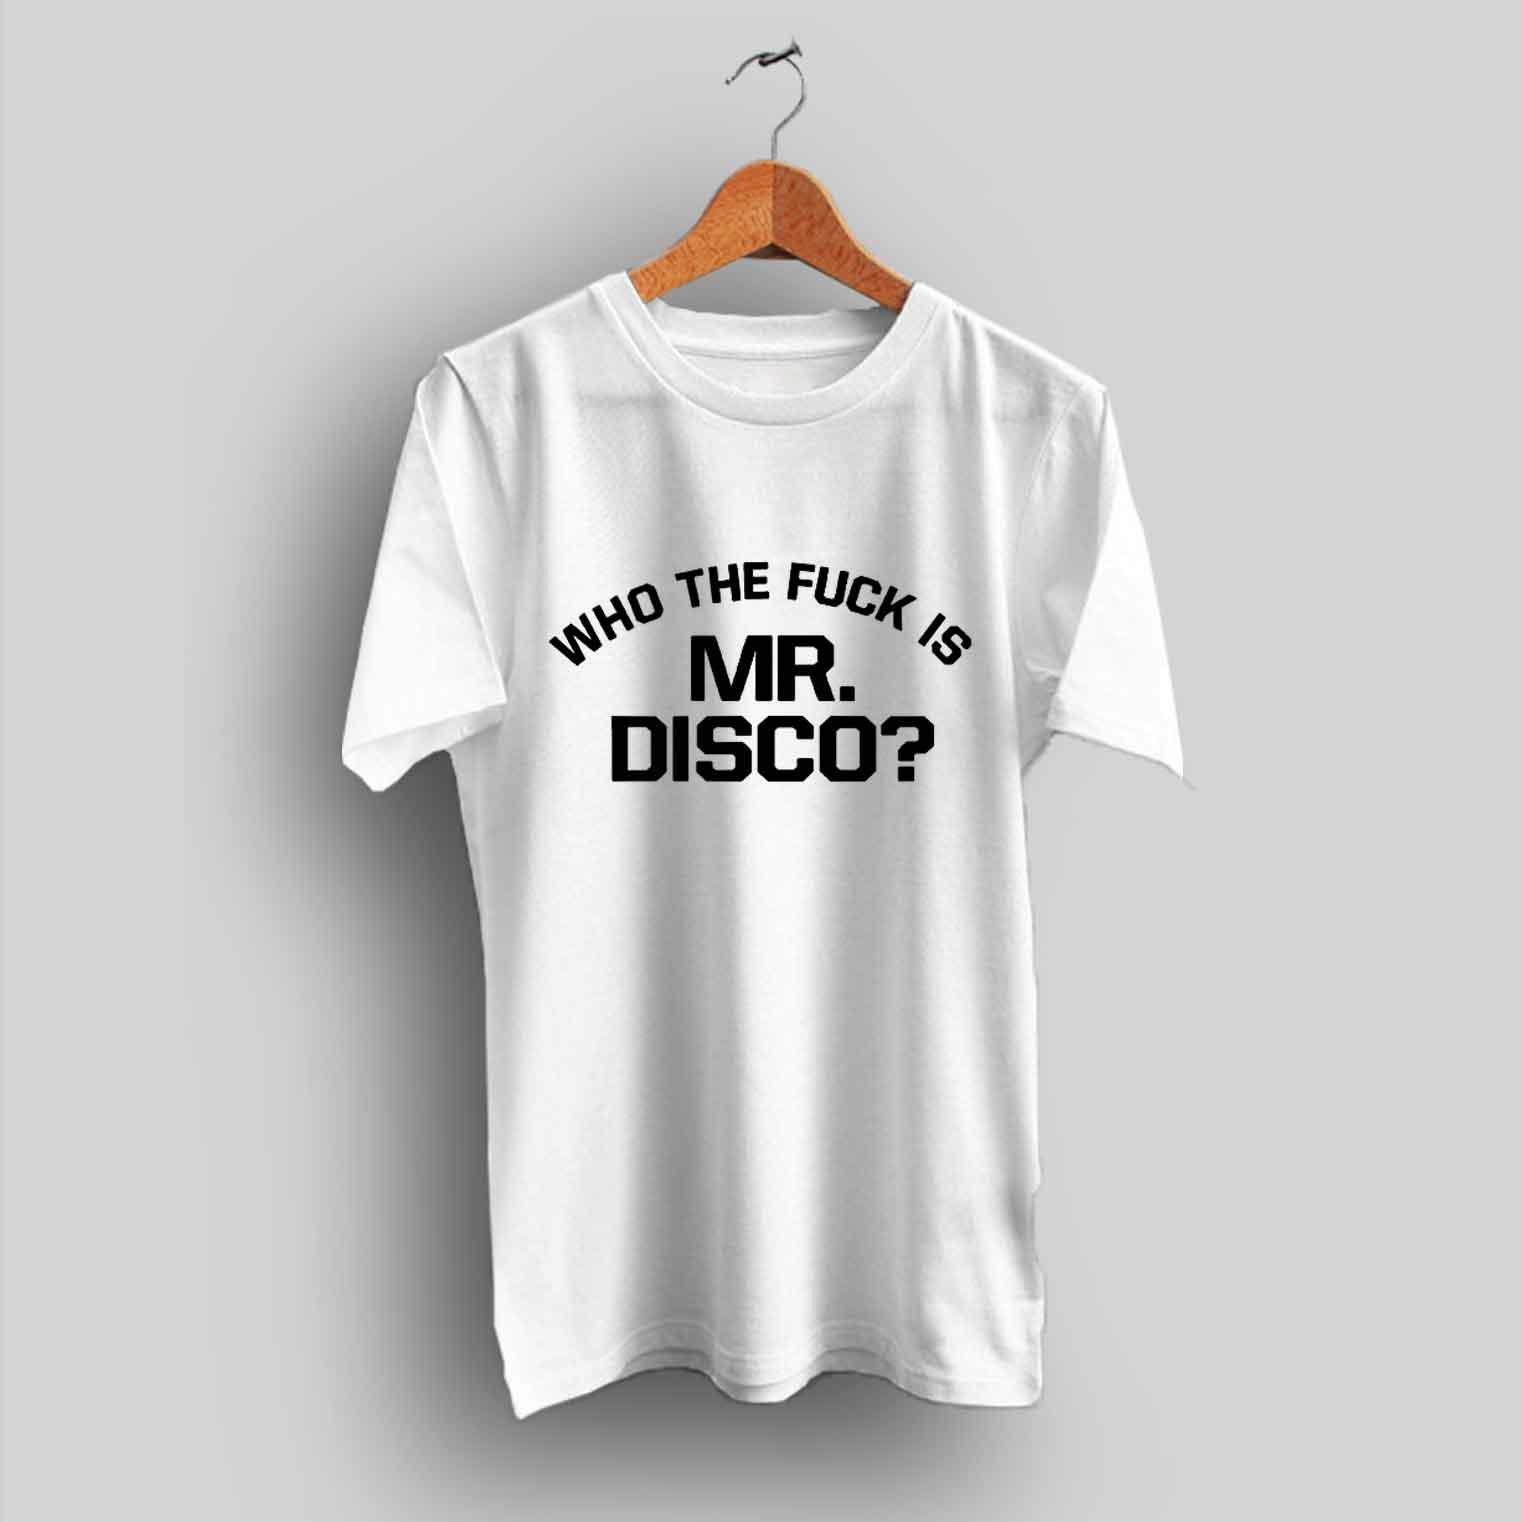 ba366e60eef0 Who The Fuck Is Mr Disco PATD T Shirt - Hotvero.com